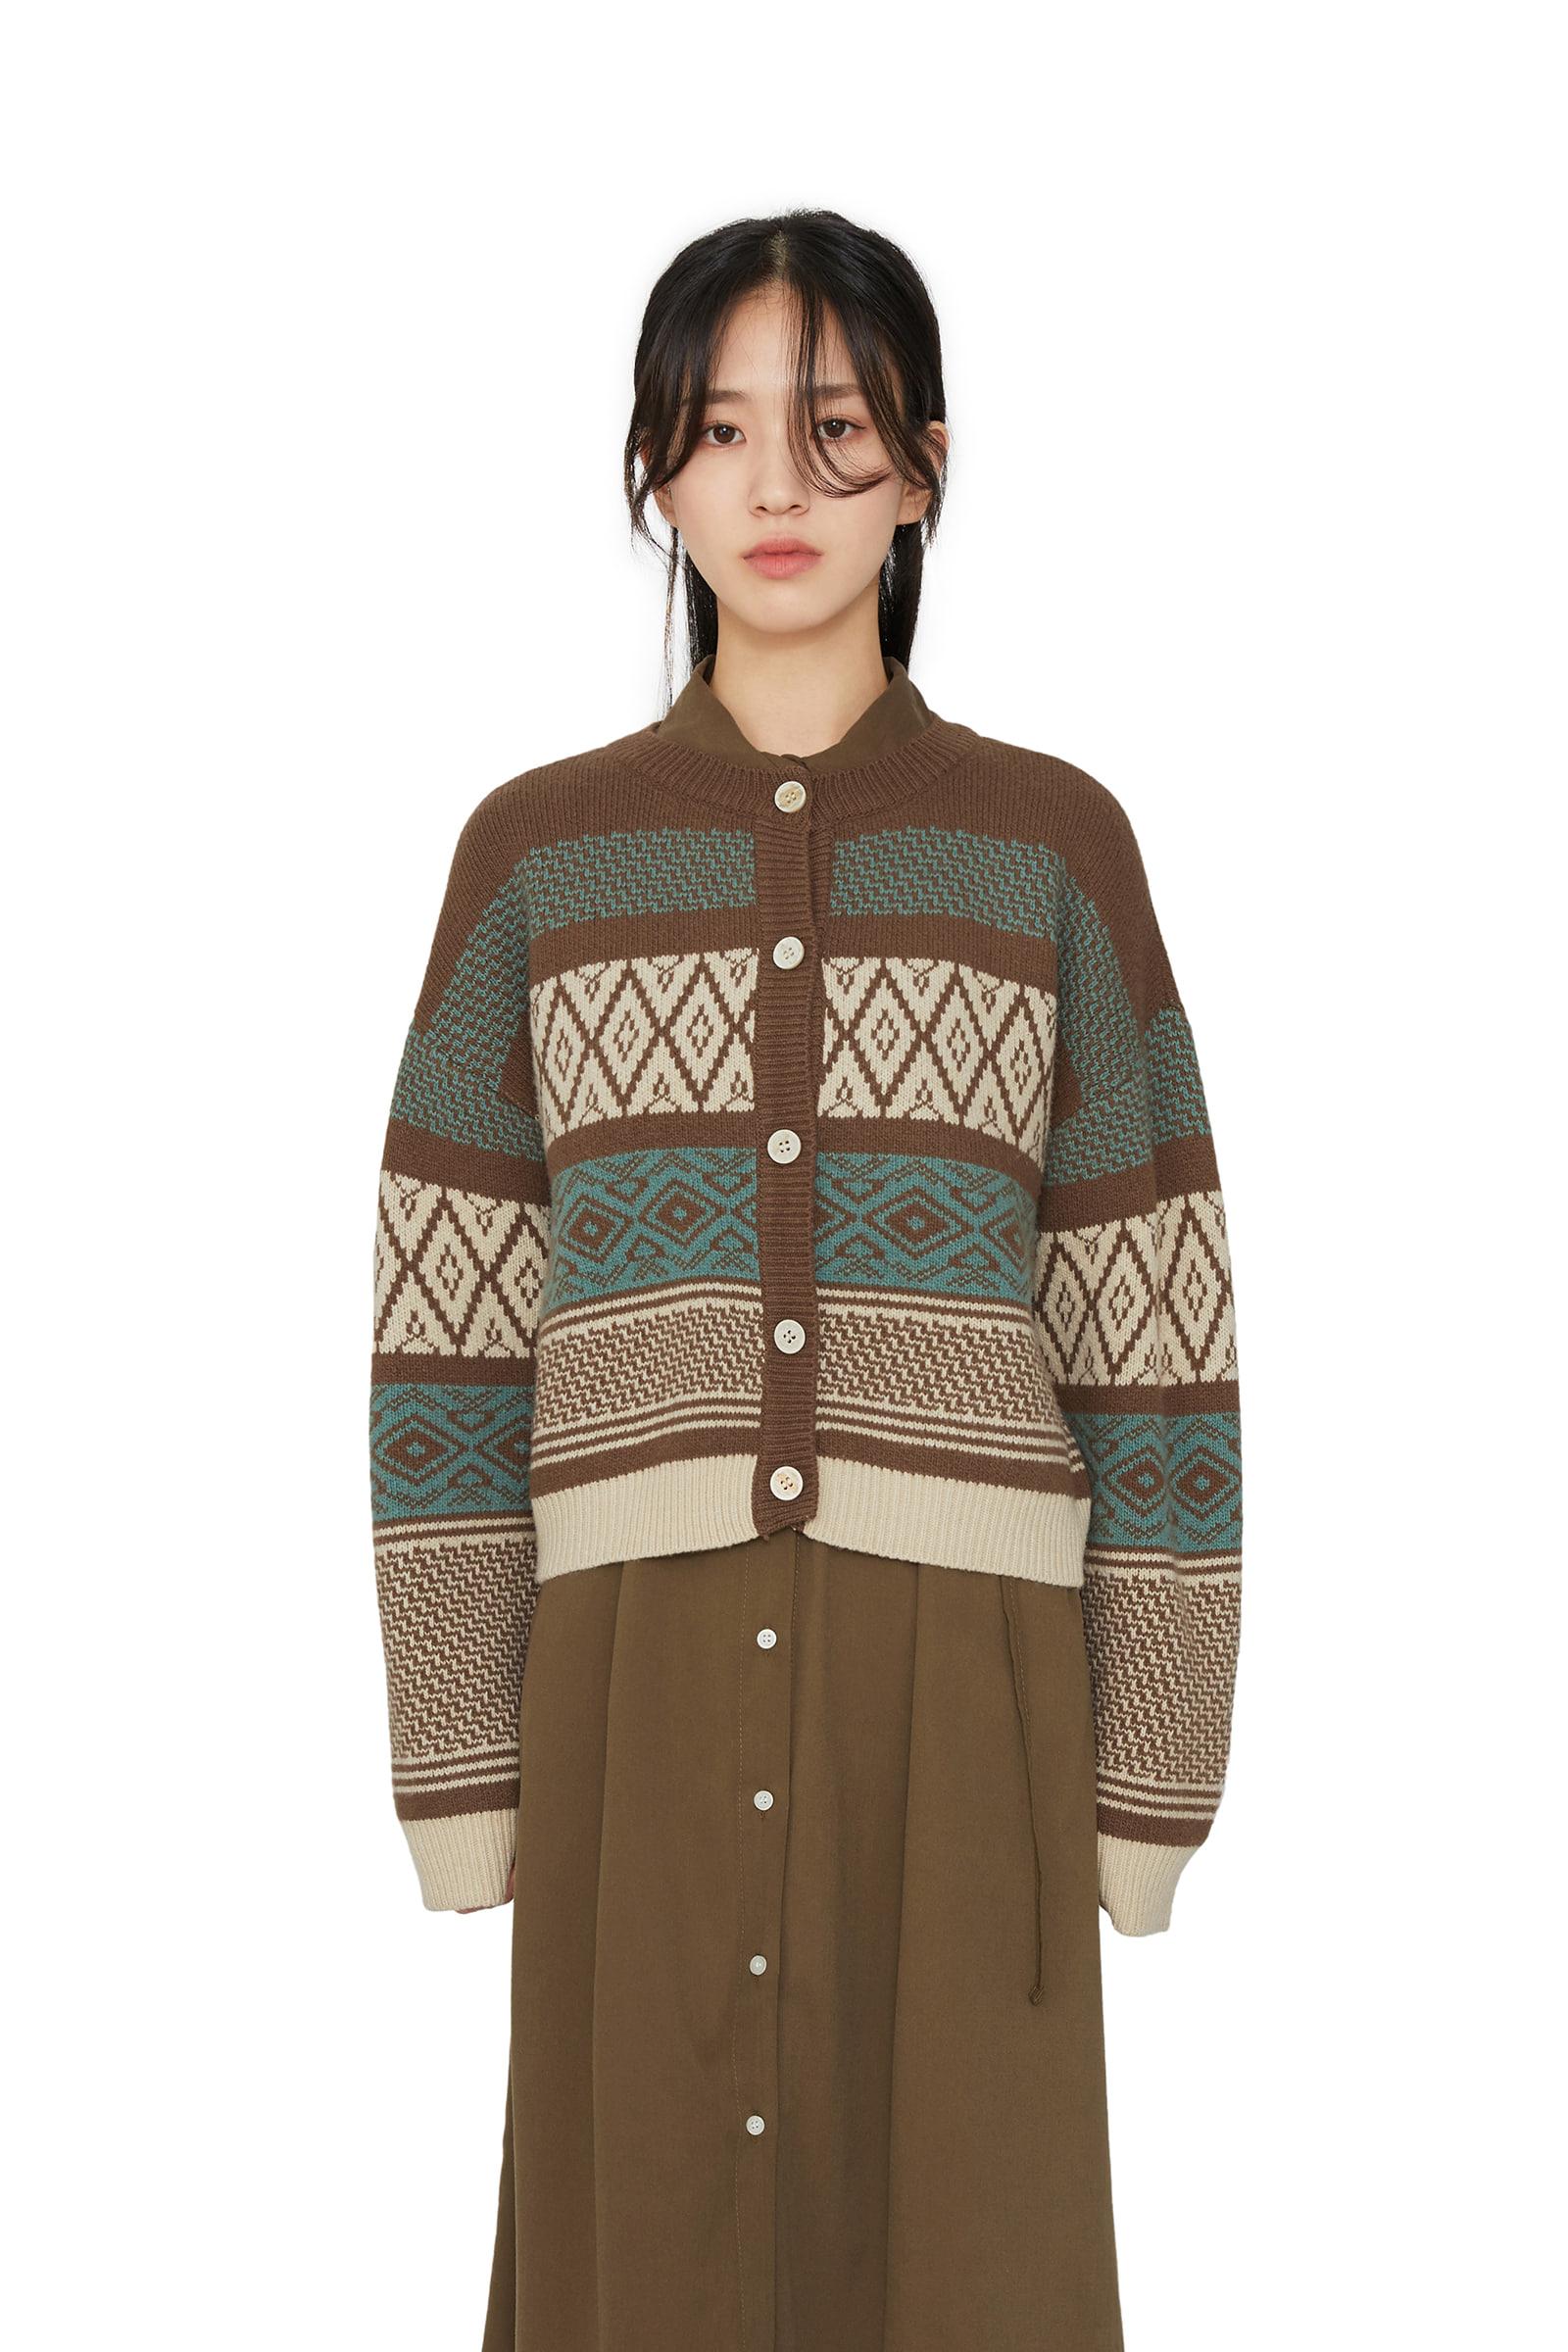 Jacquard pattern knit cardigan